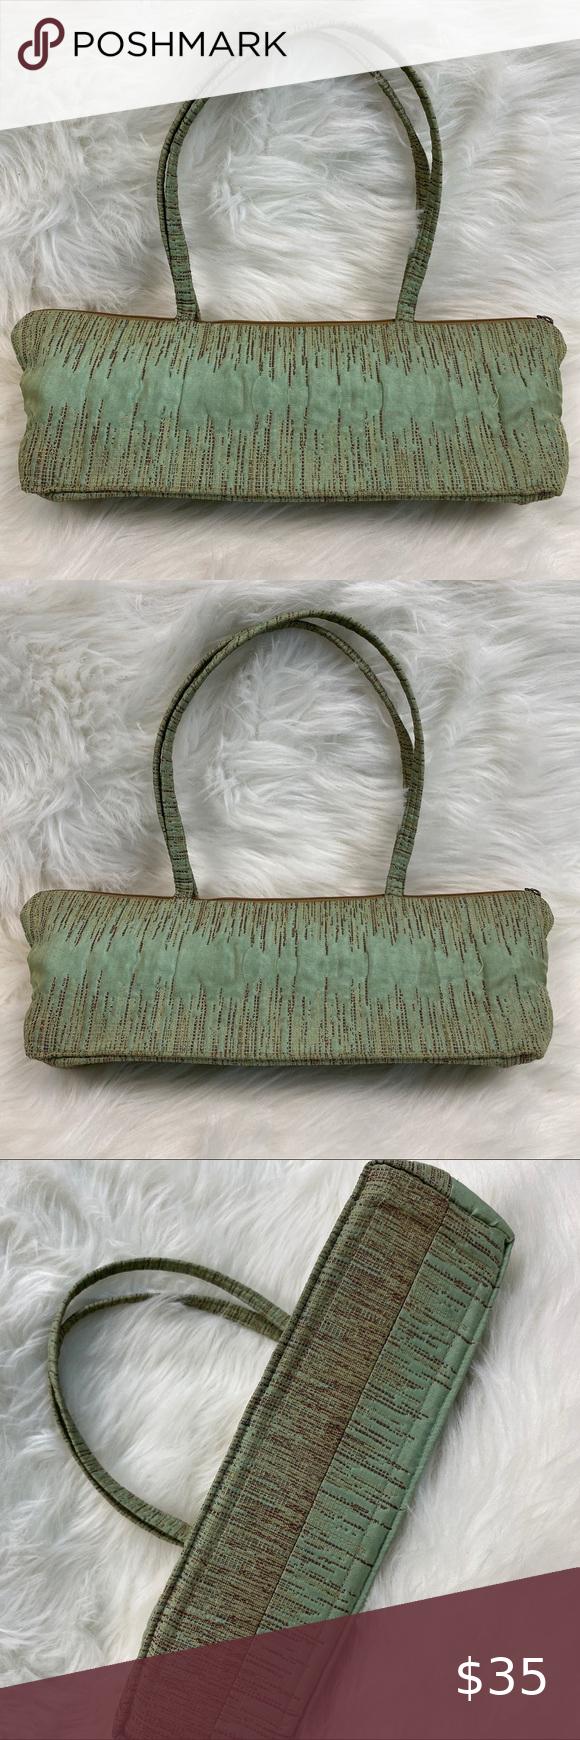 Shoulder Bag Handmade In Boulder Co By Maruca In 2020 Shoulder Bag Tapestry Fabric Handmade